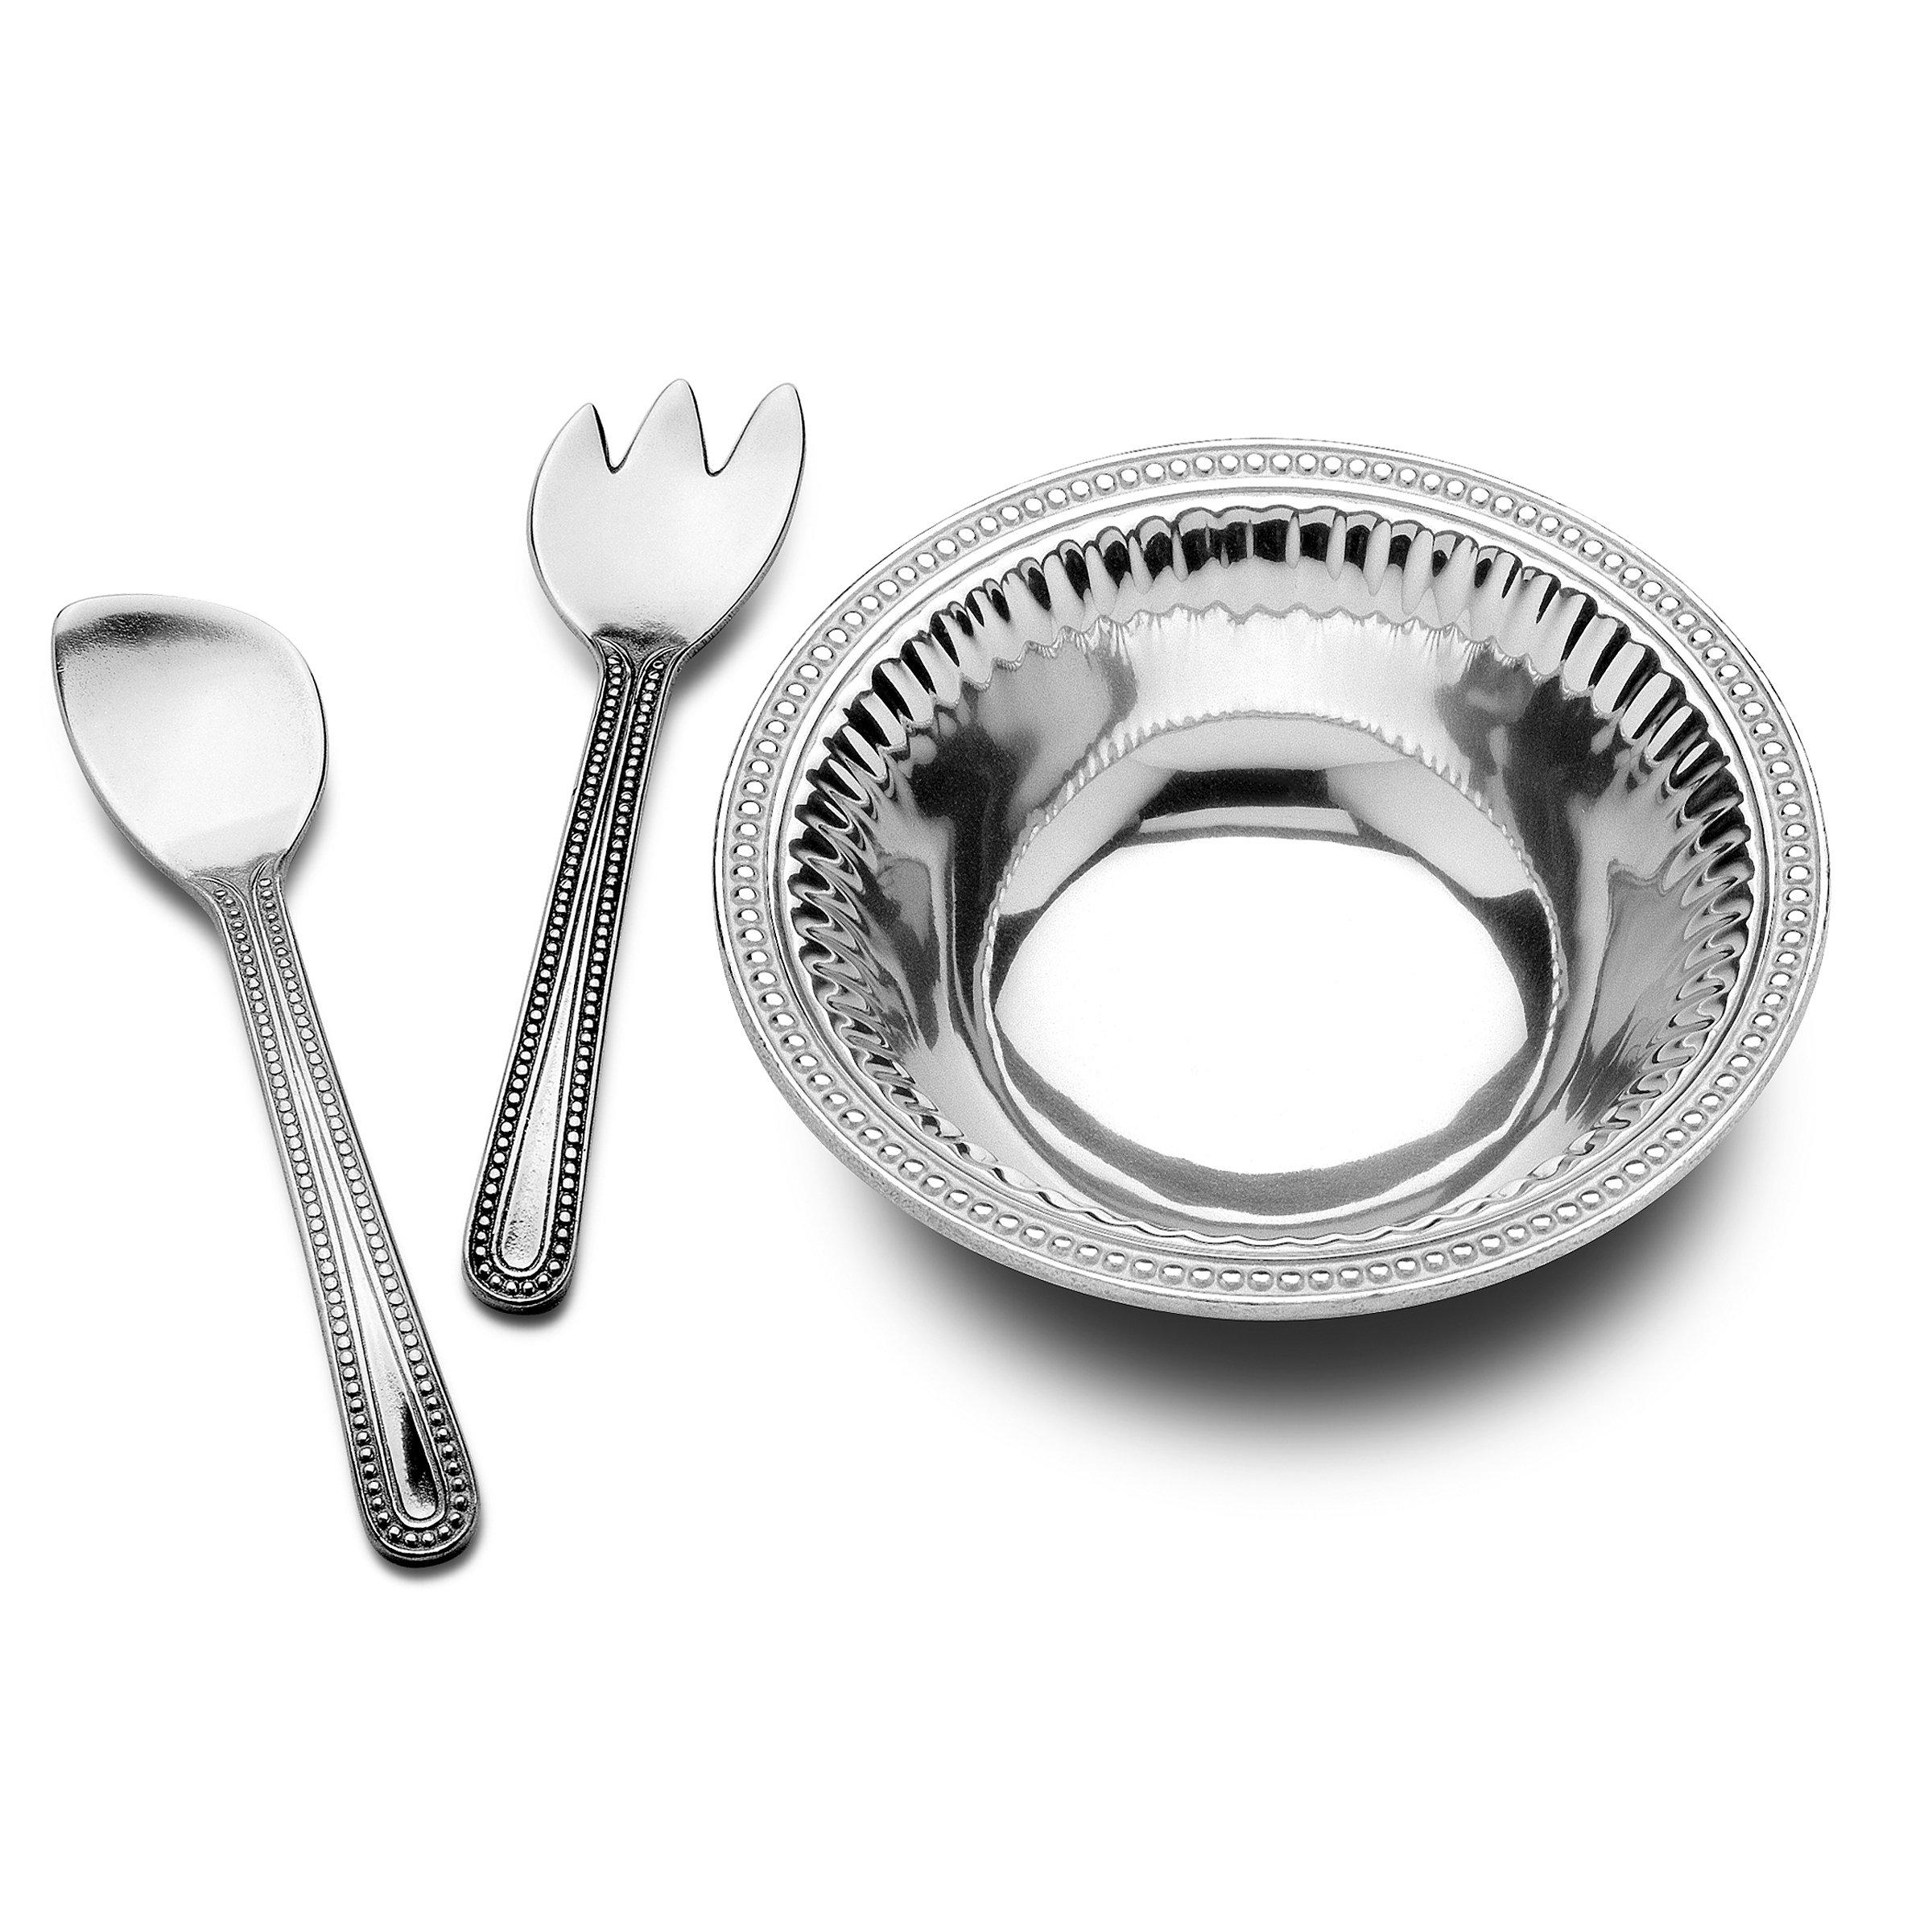 Wilton Armetale Flutes and Pearls Medium 3-Piece Salad Serving Set, 3-Quart